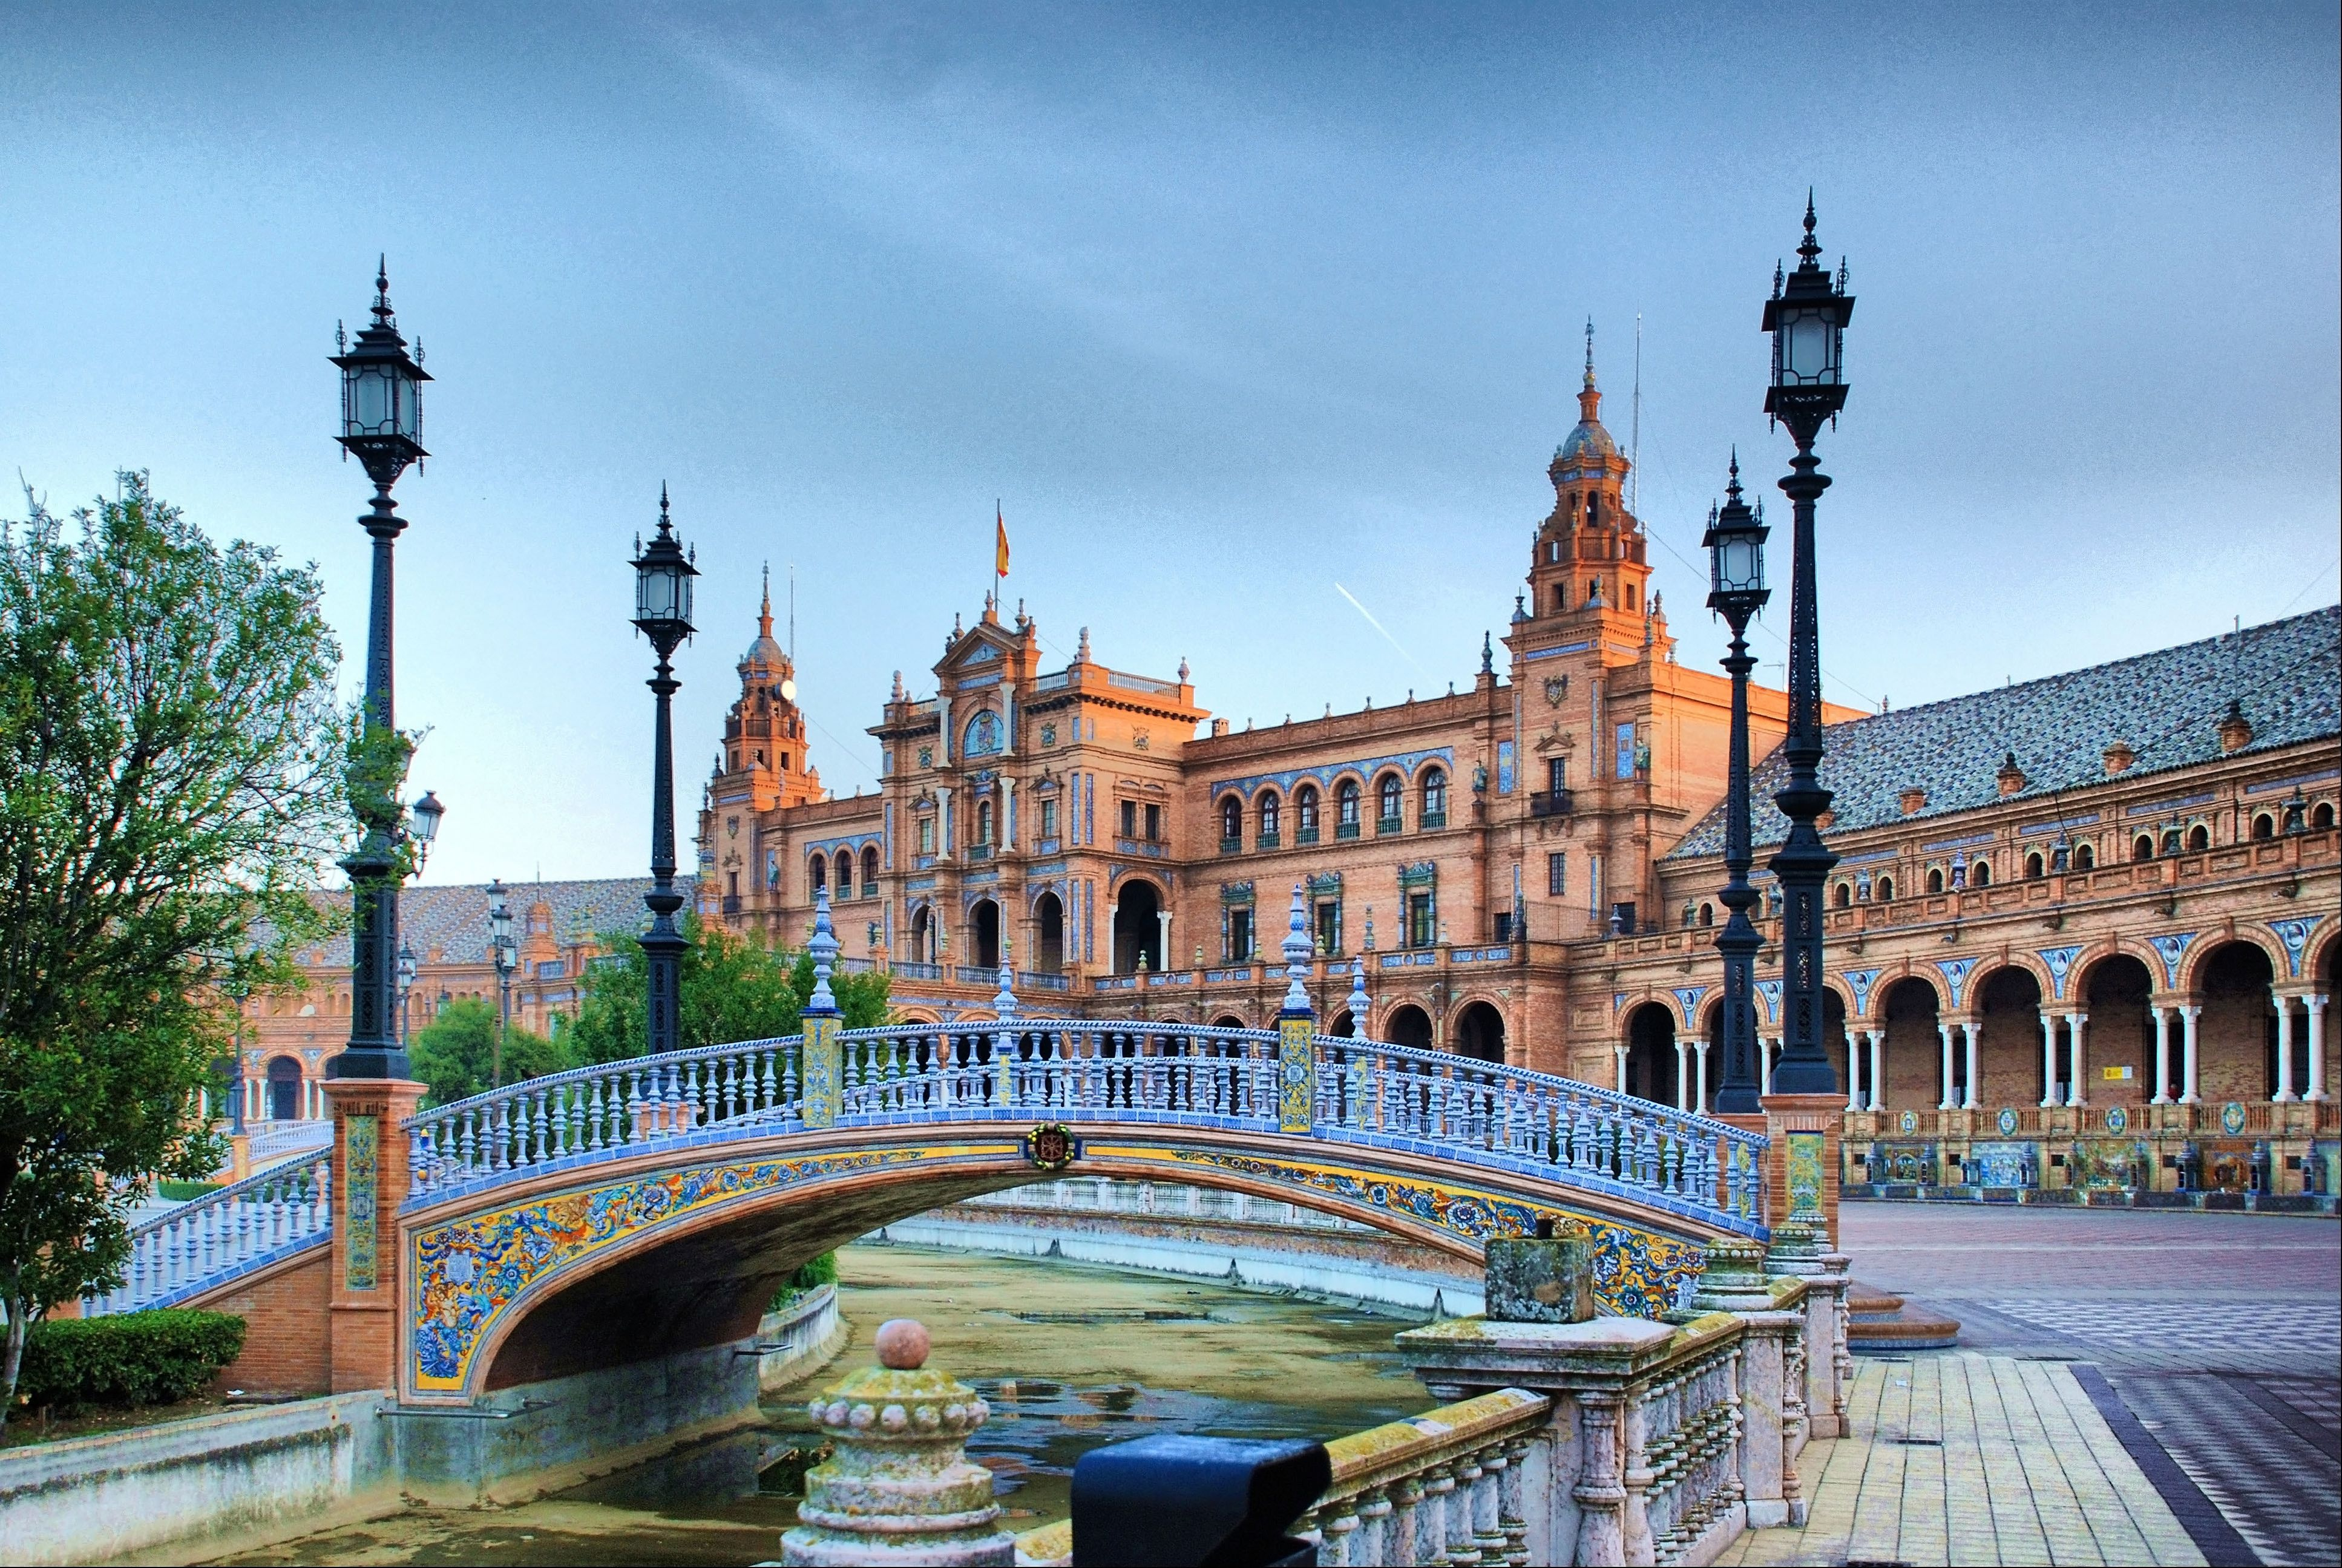 город севилья испания фото